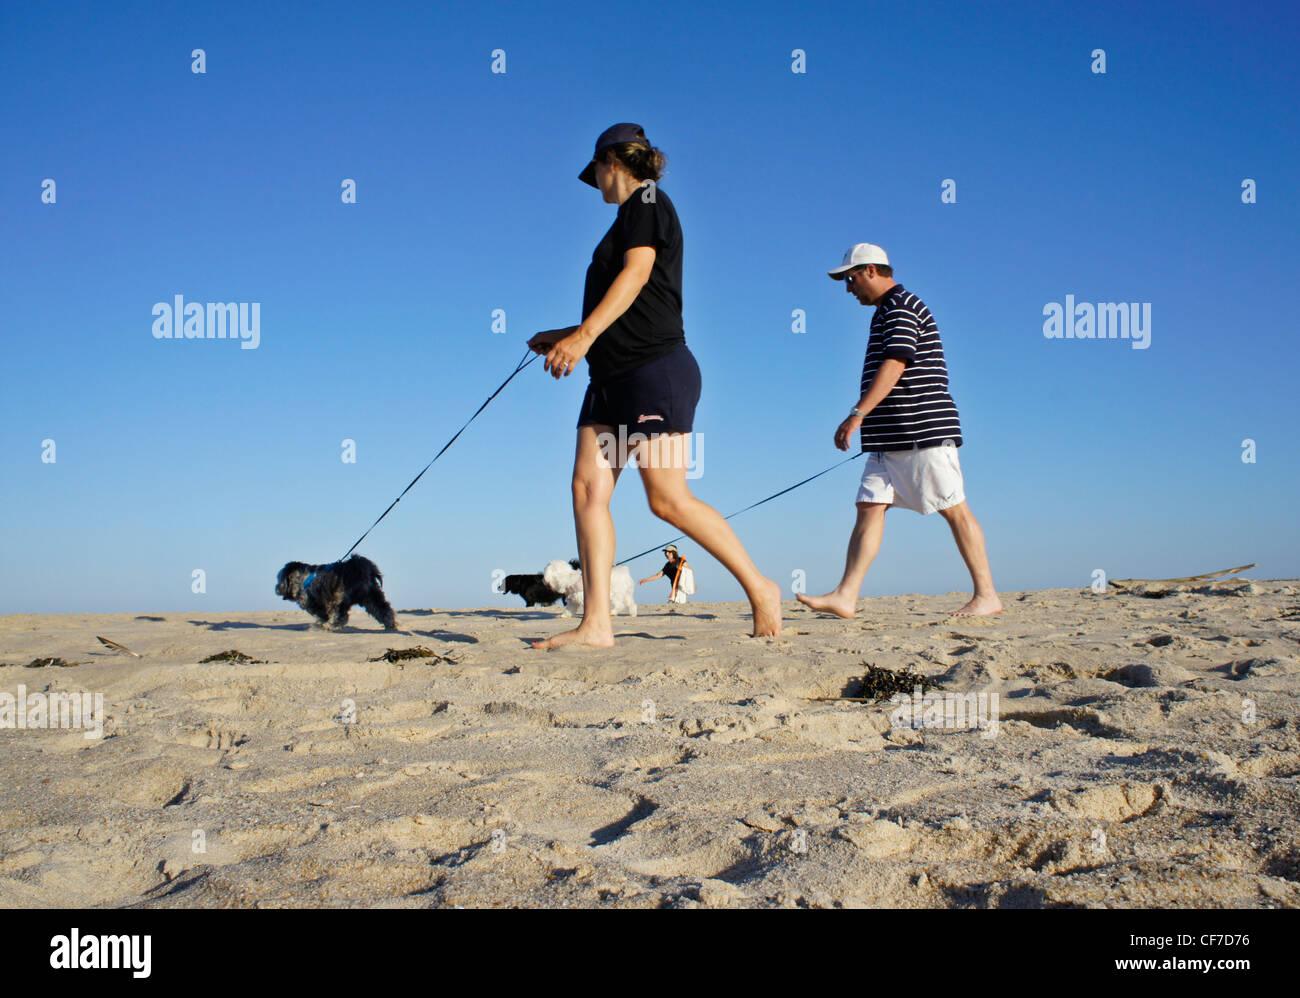 Walking dogs on the beach in Bridgehampton, NY - Stock Image